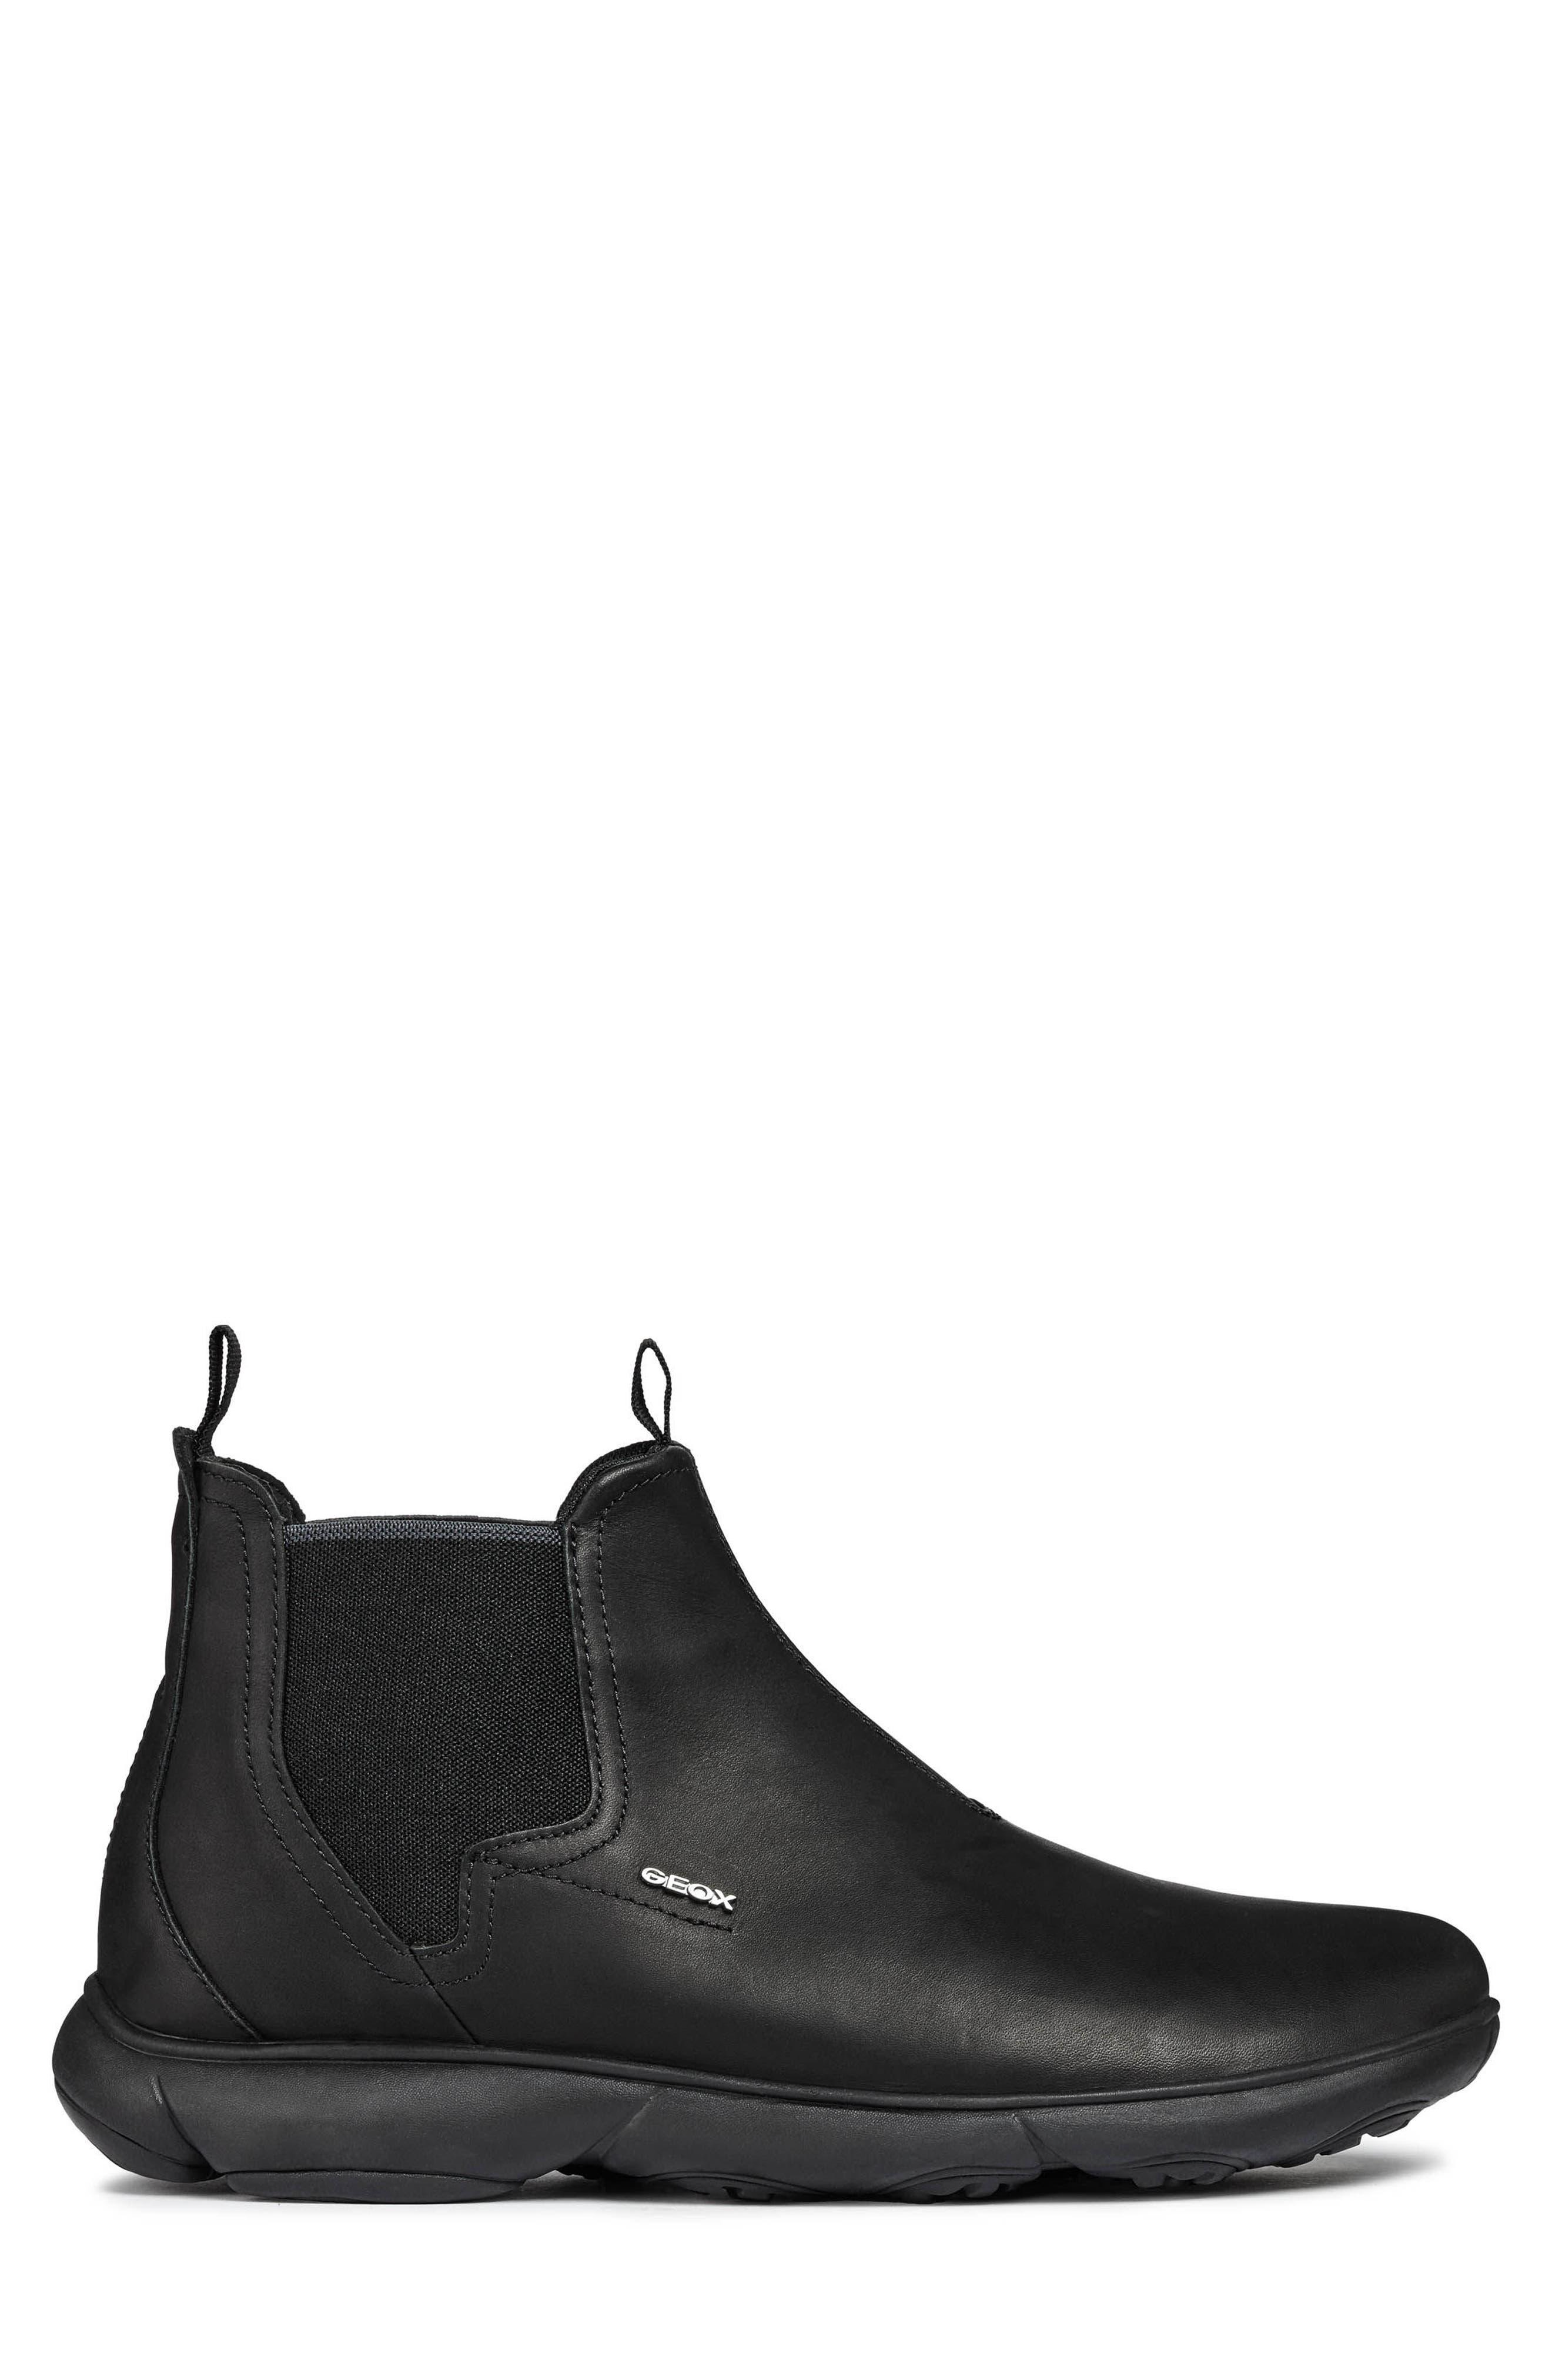 Nebula Mid Chelsea Sneaker,                             Alternate thumbnail 3, color,                             BLACK LEATHER